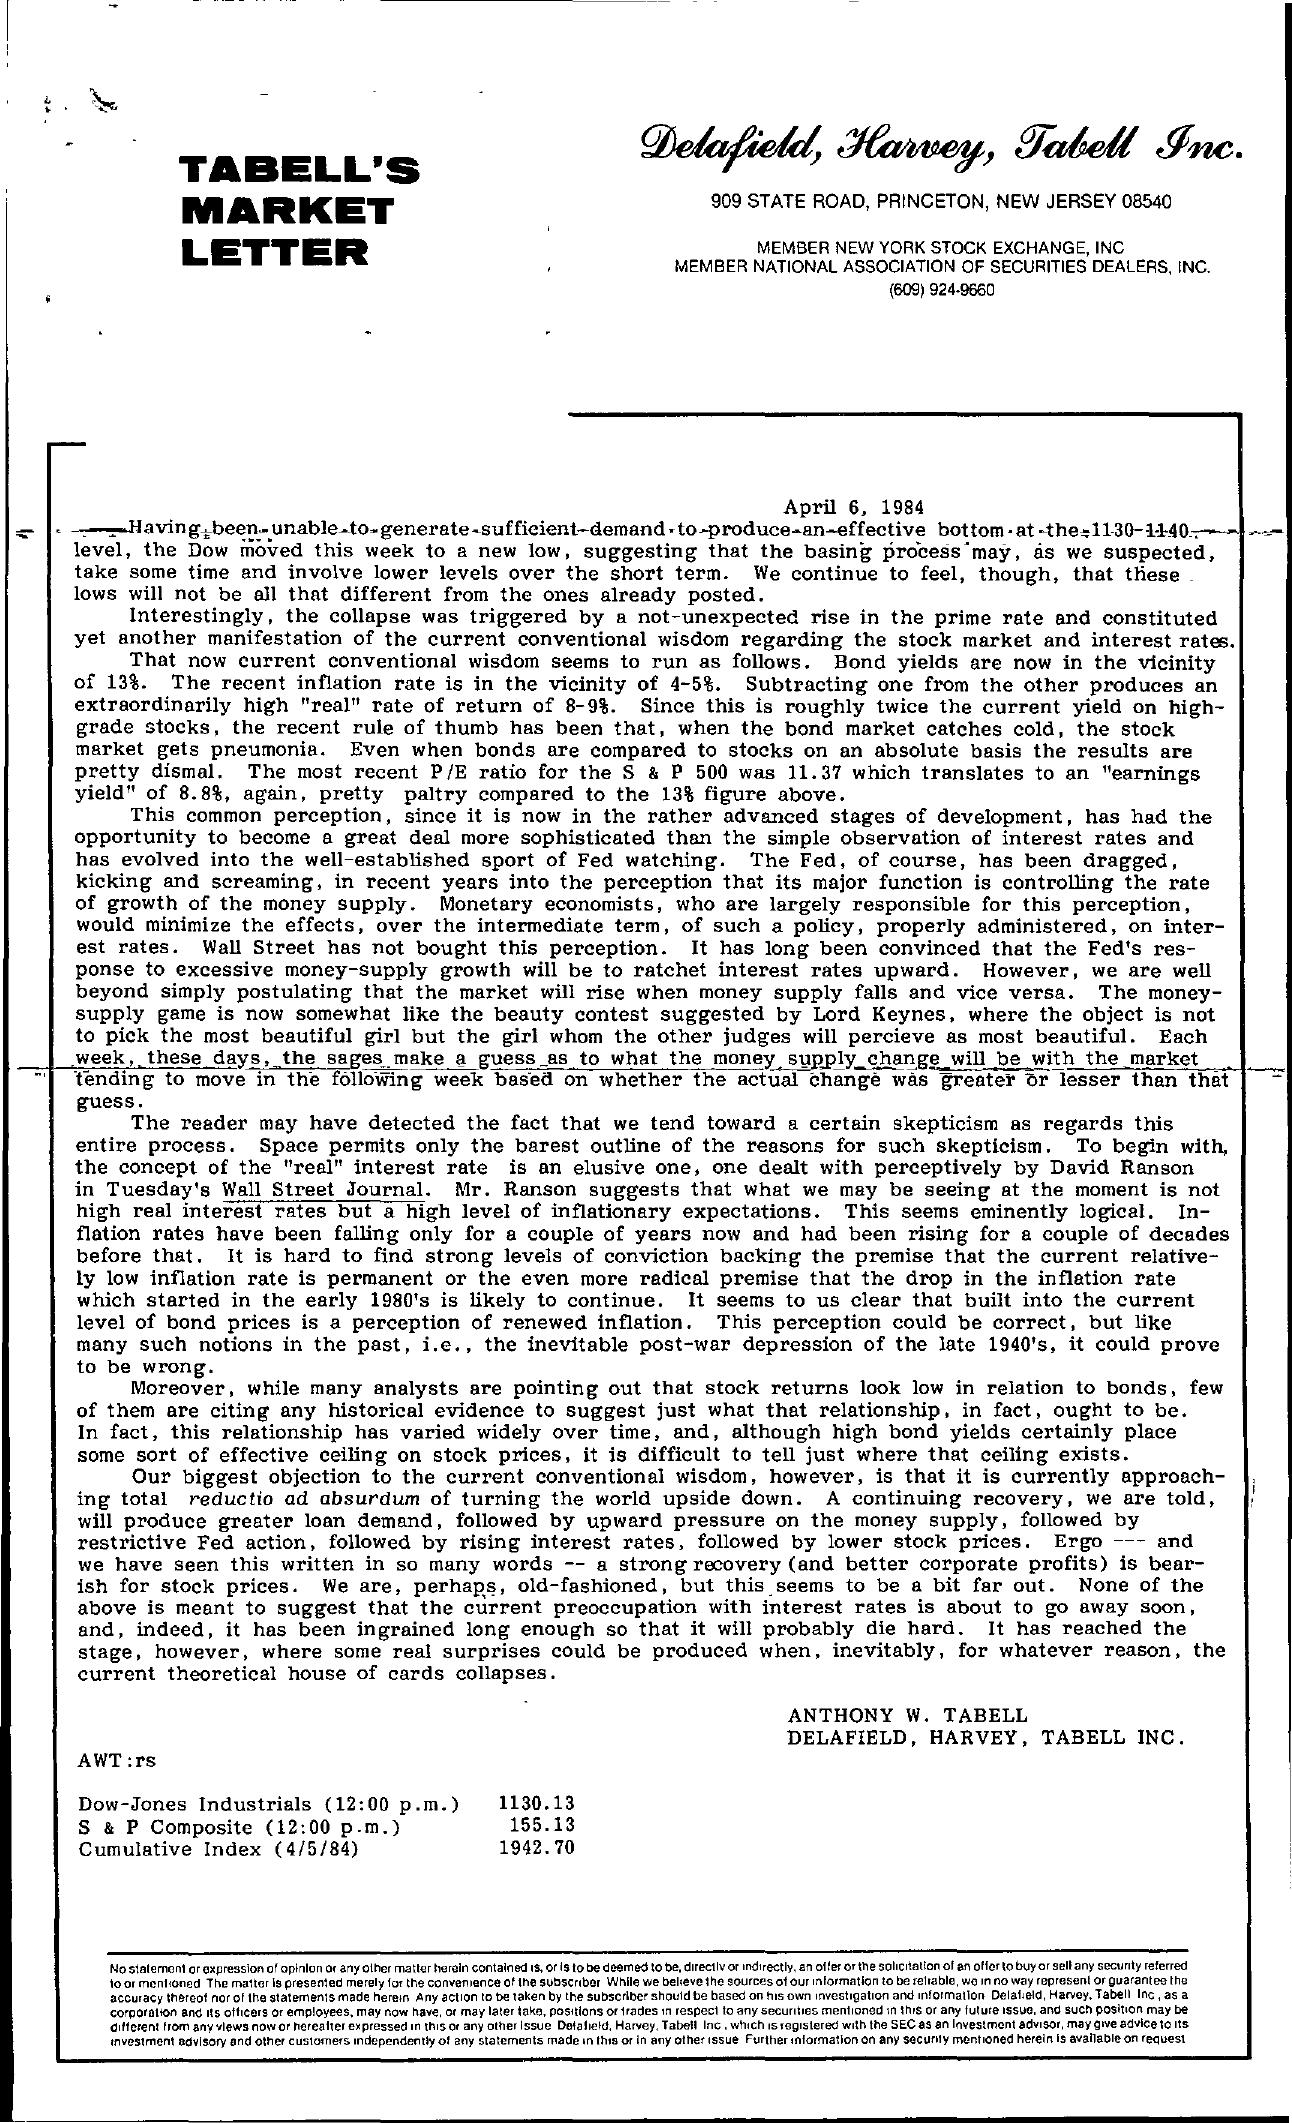 Tabell's Market Letter - April 06, 1984